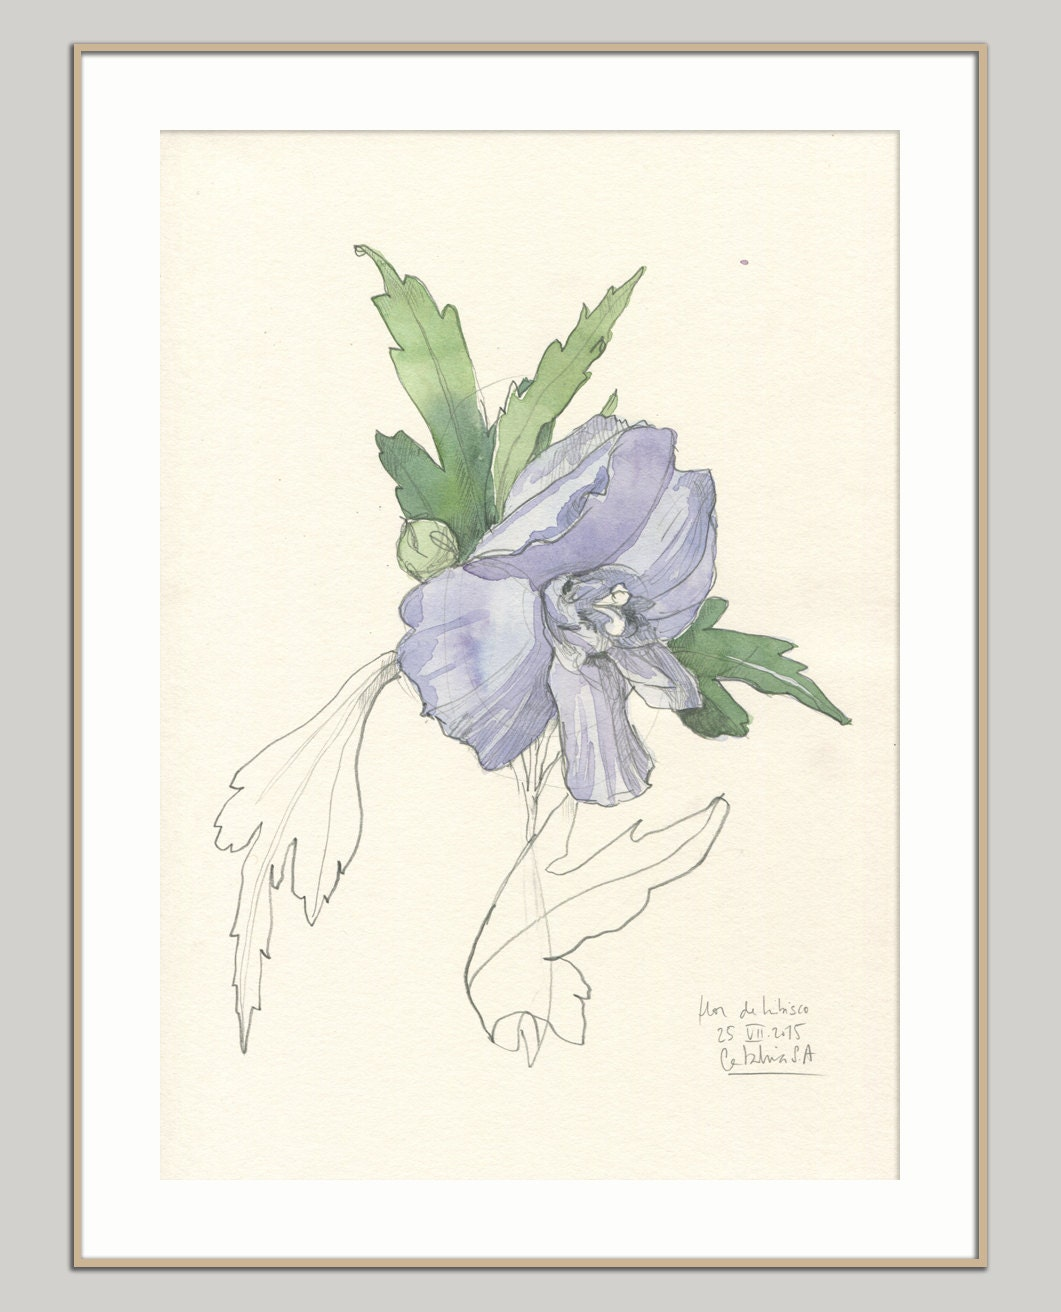 Hibiscus Drawing 1 Original Watercolour And Pencil Drawing